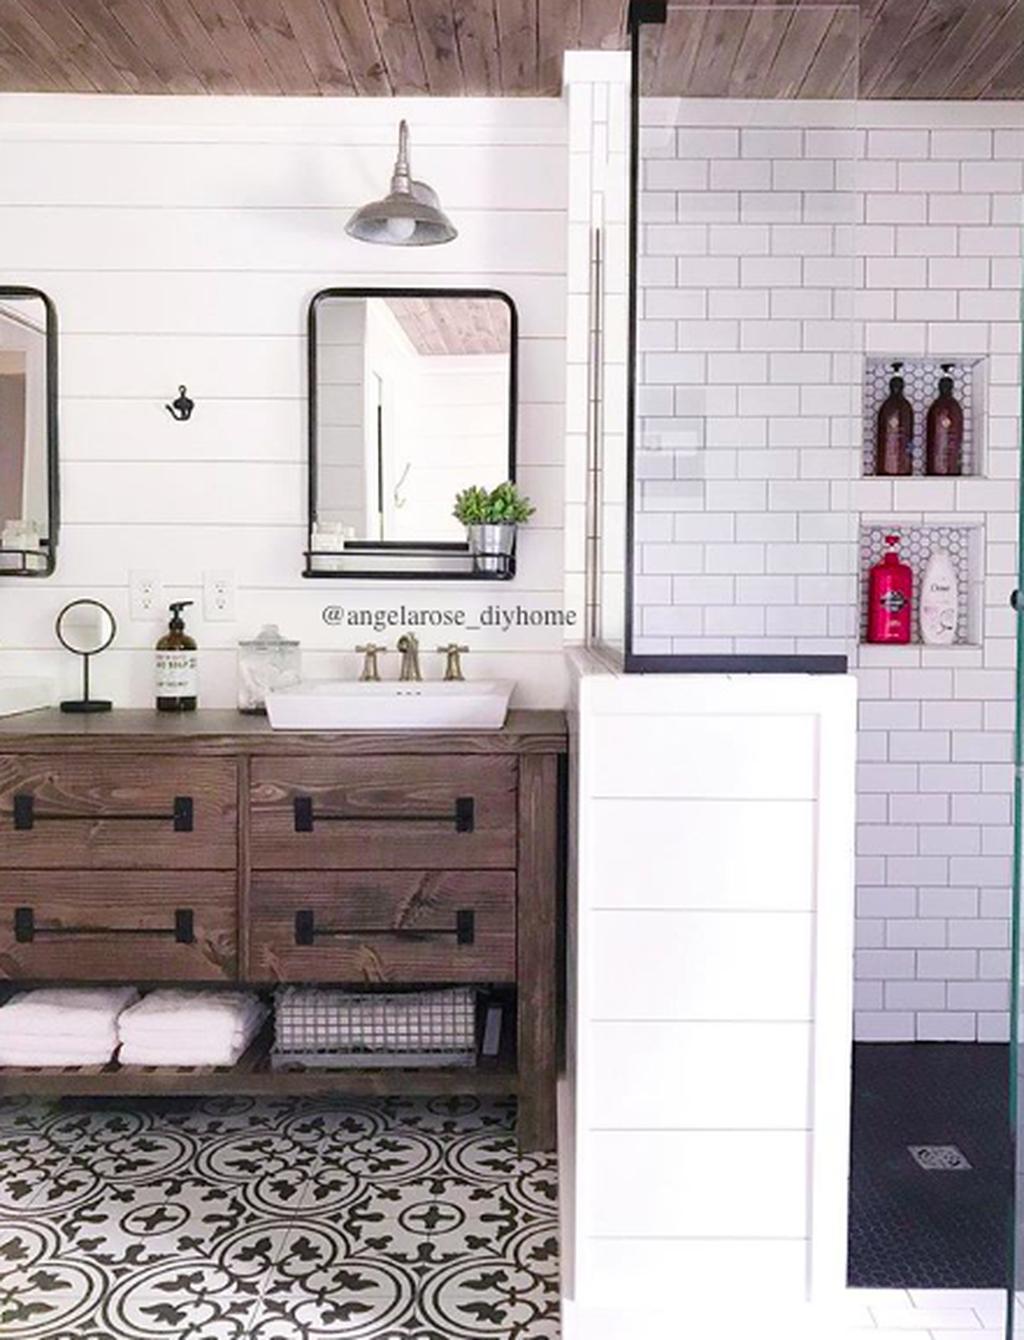 Astonishing Farmhouse Shower Tile Decor Ideas To Try 33